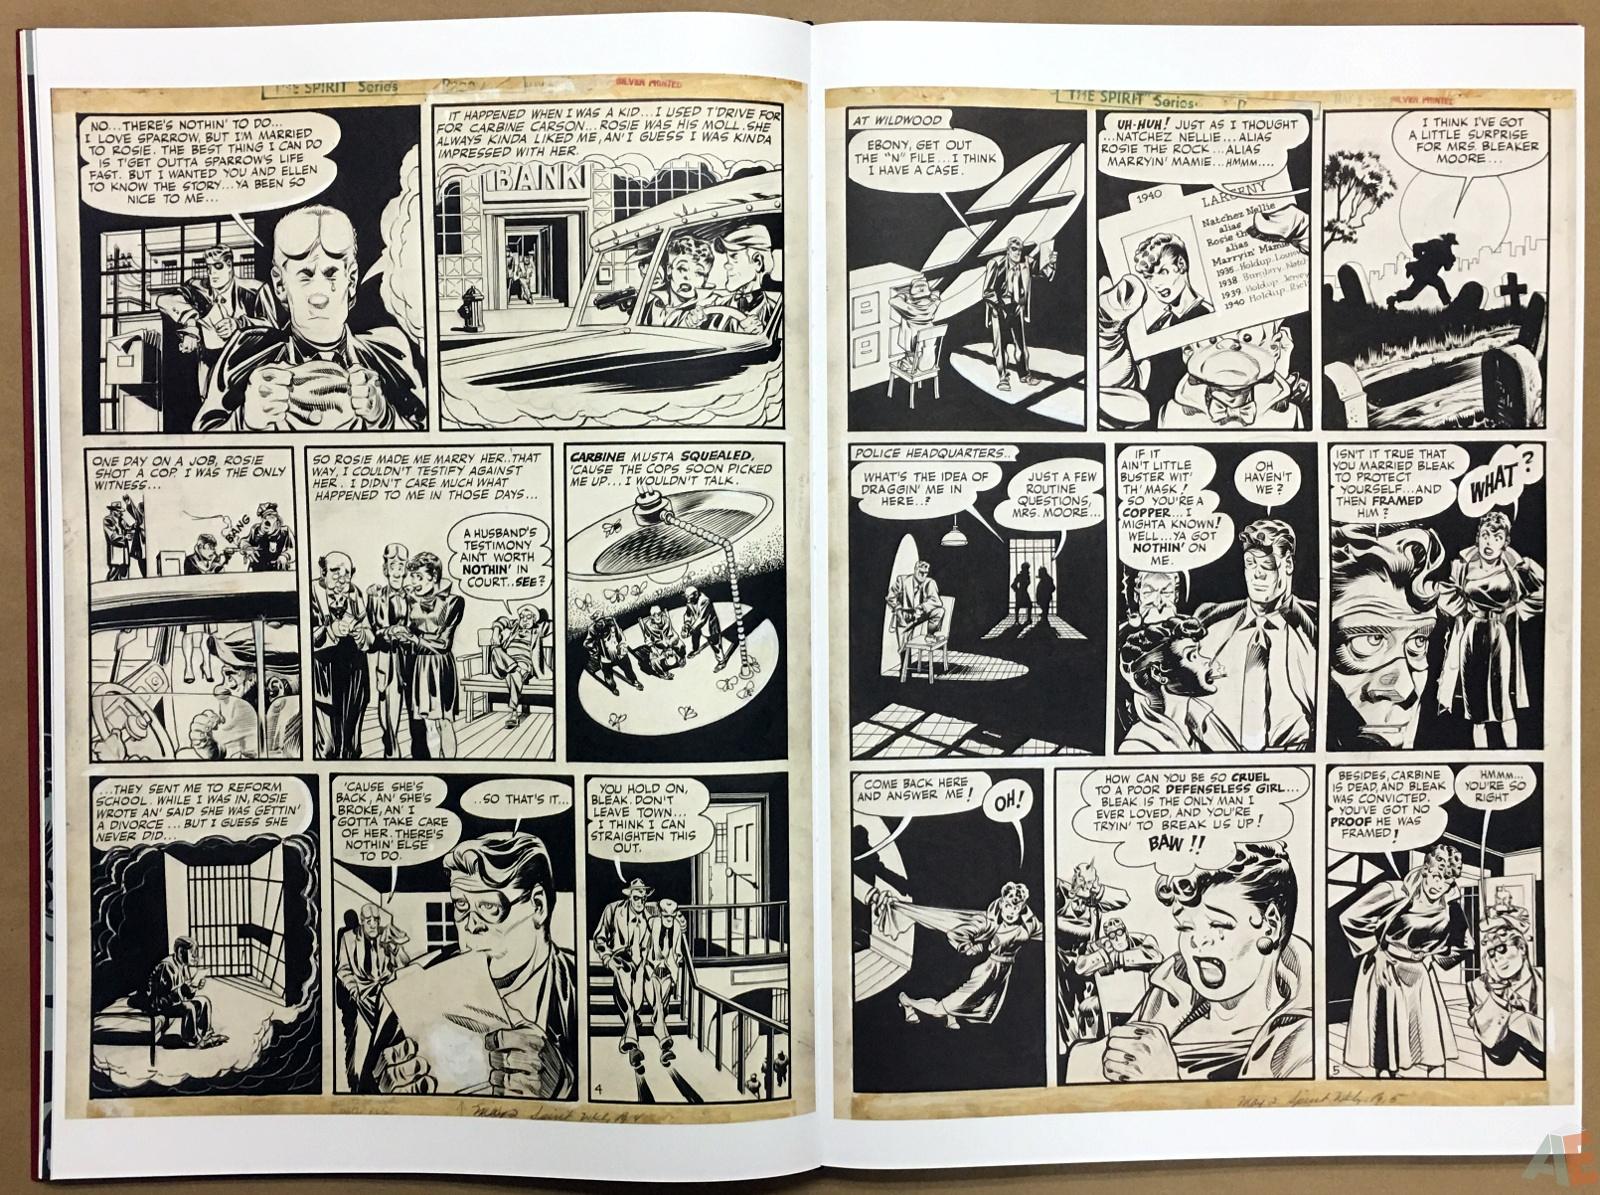 Will Eisner's The Spirit Artist's Edition Volume Two